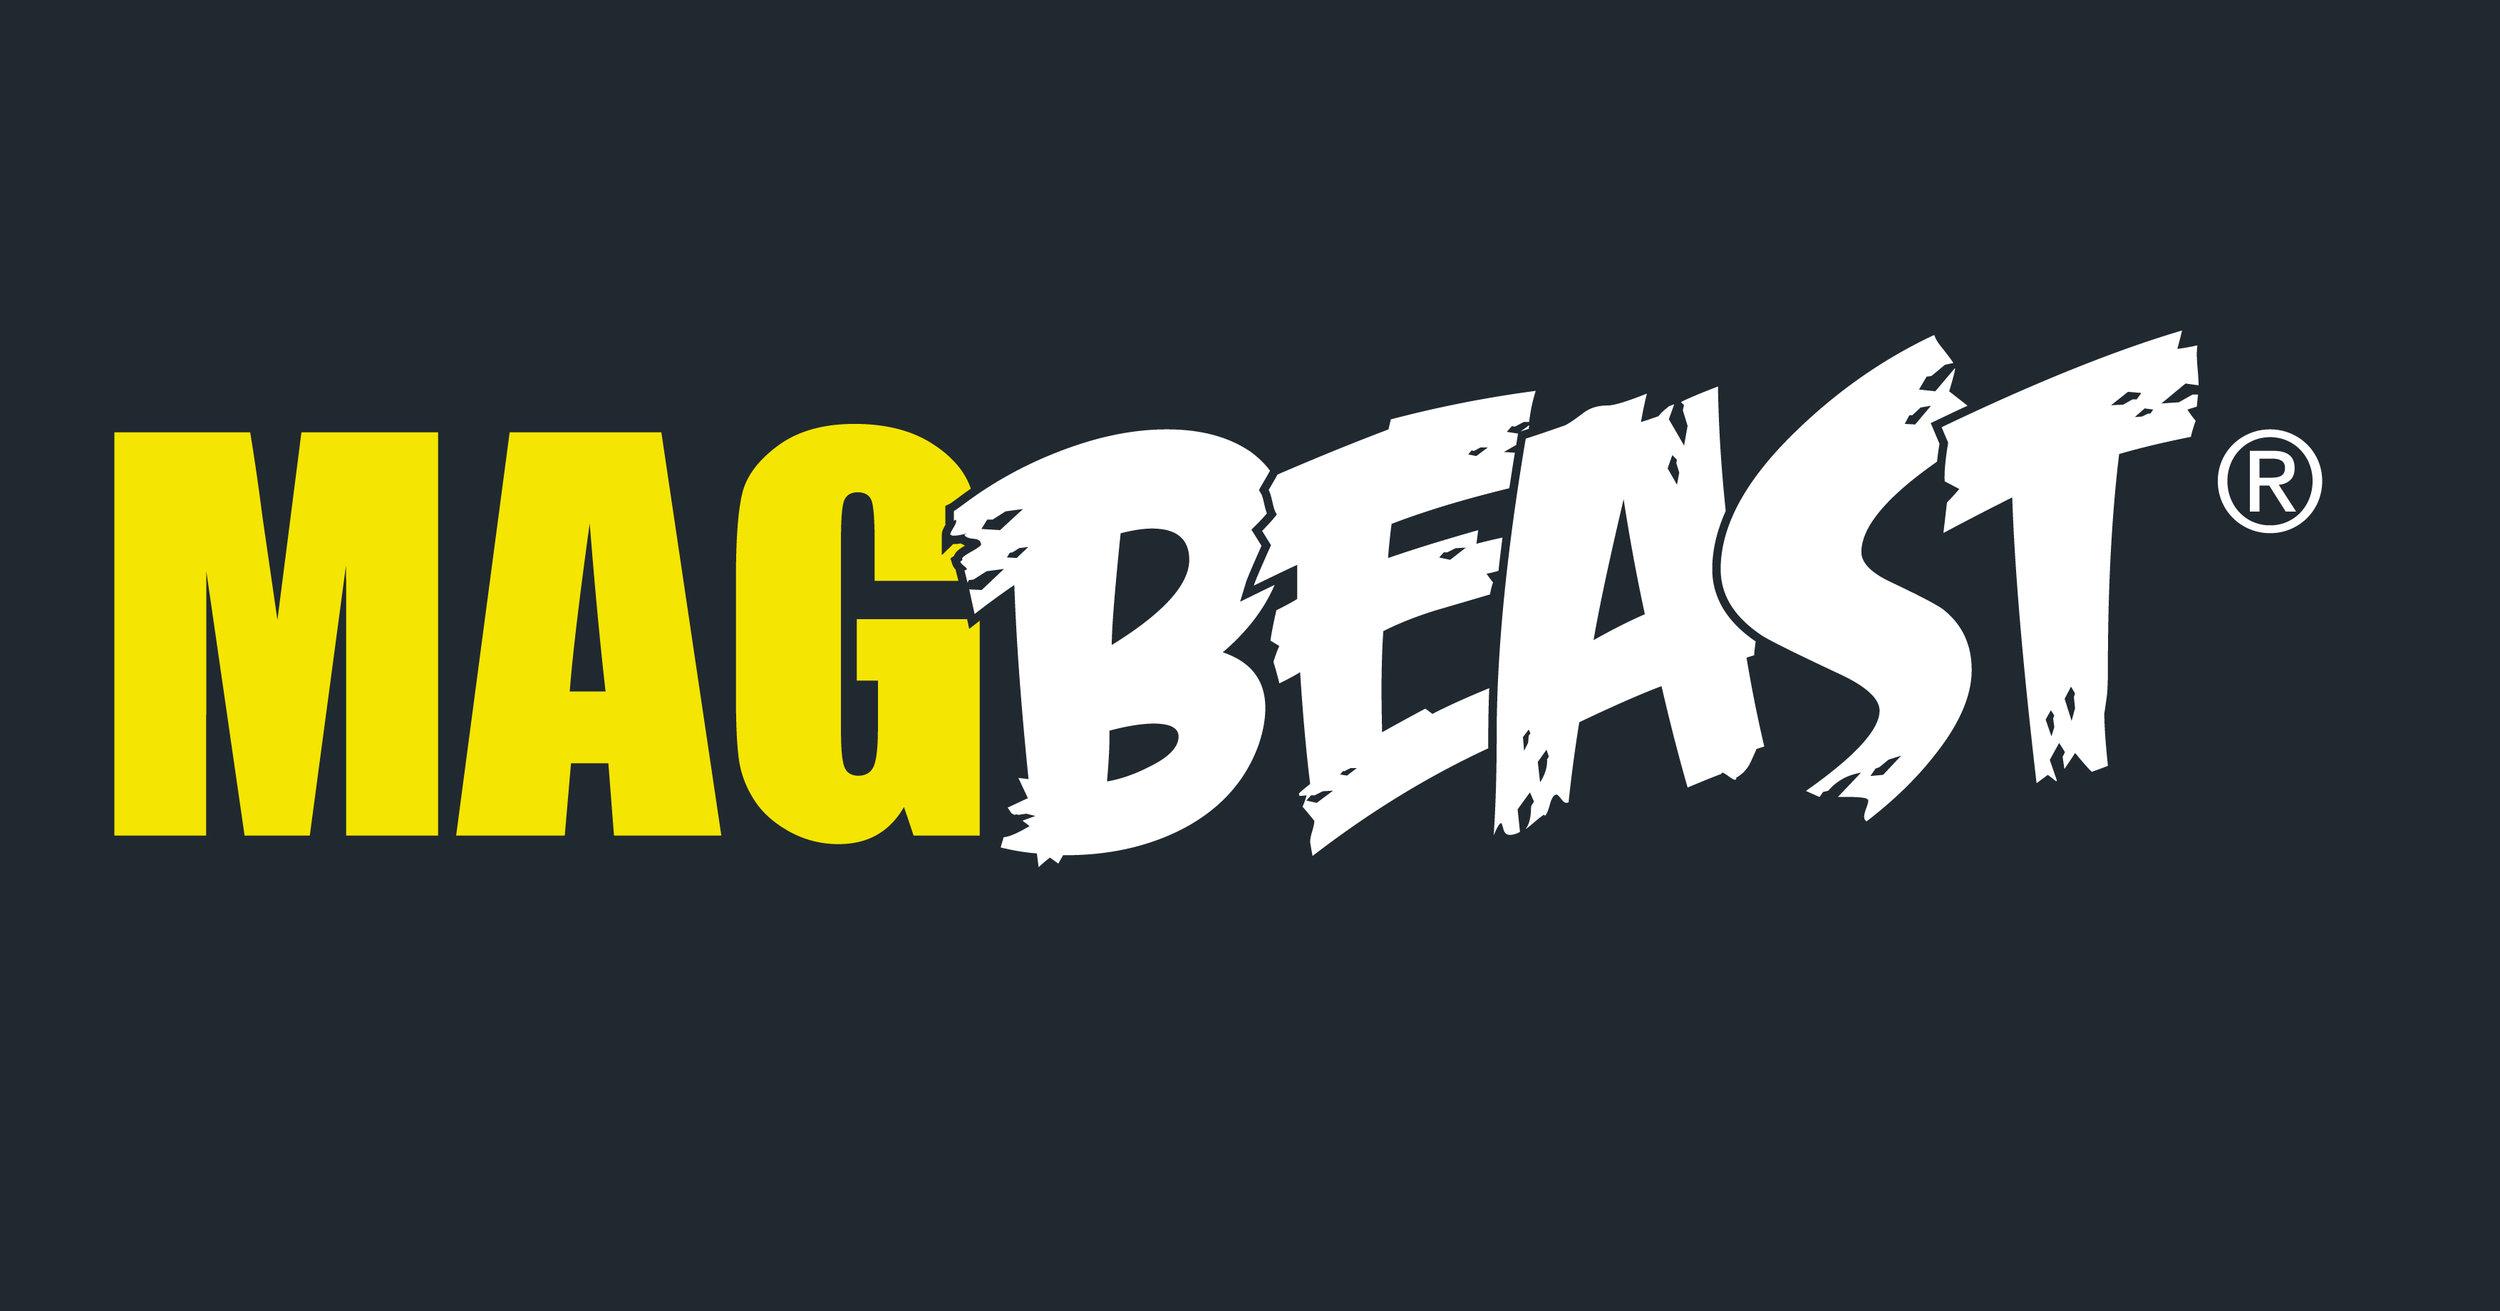 MagBeastonly_Logo_onblack trade.jpg